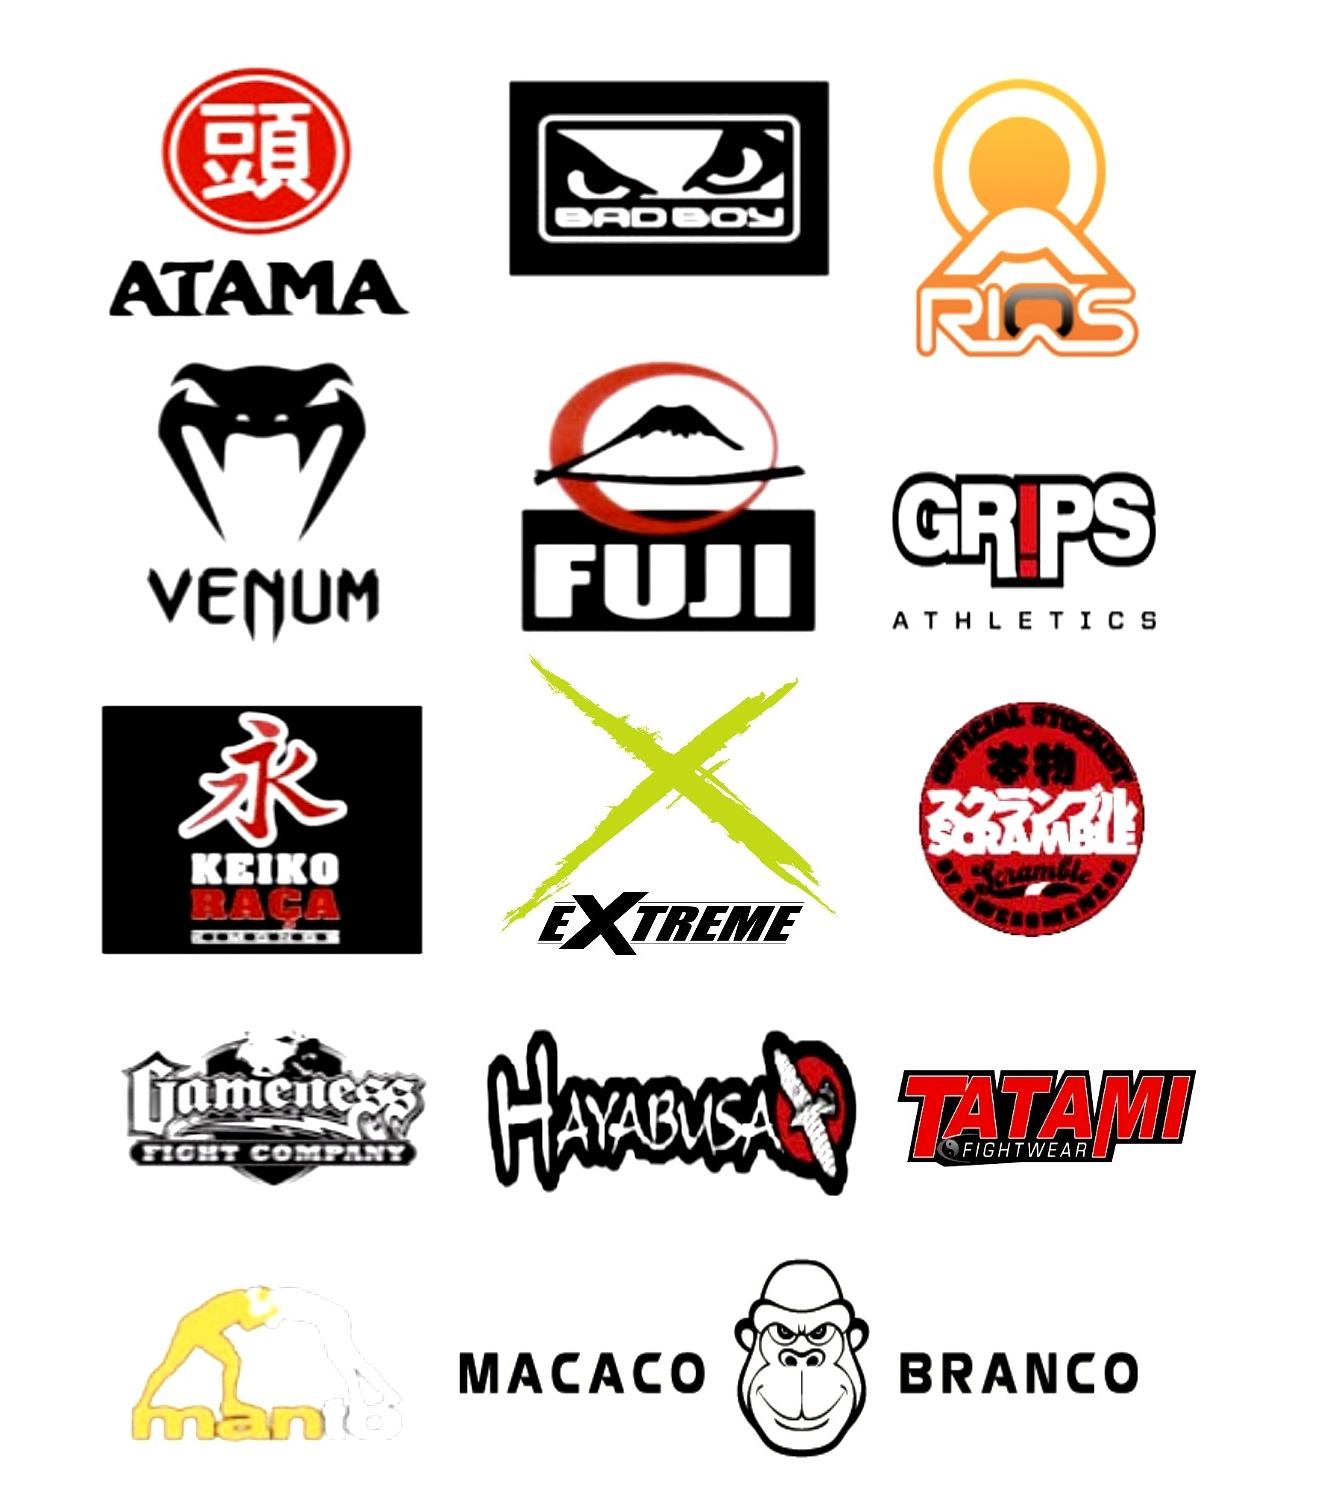 le marche dei gi del brazilian jiu jitsu list of jiu jitsu  arte suave jiu jitsu lifestyle audiomack.php #9